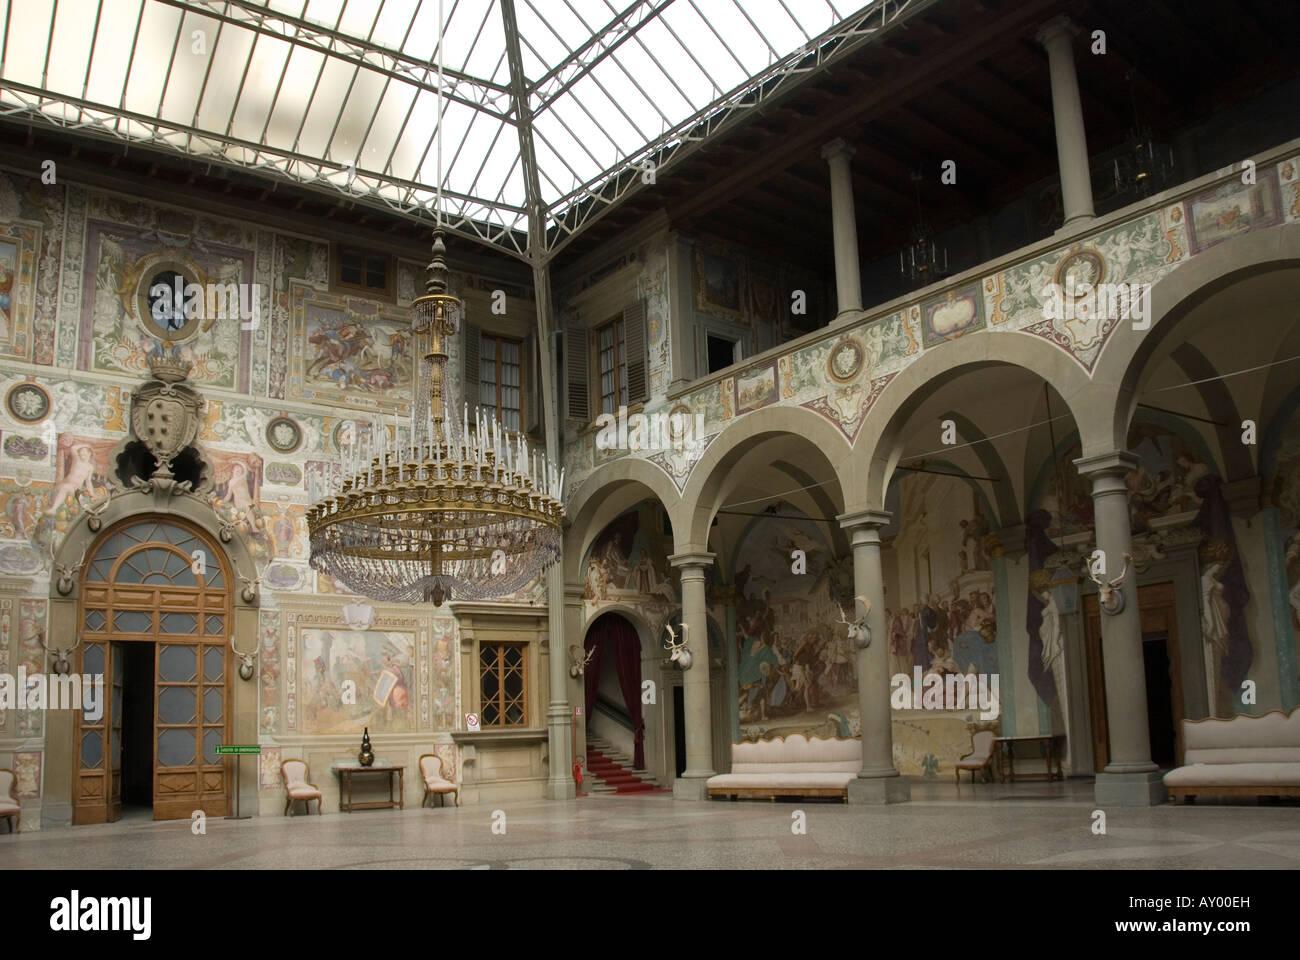 Villa Medici courtyard with the 19th century roof in the villa medici la petraia